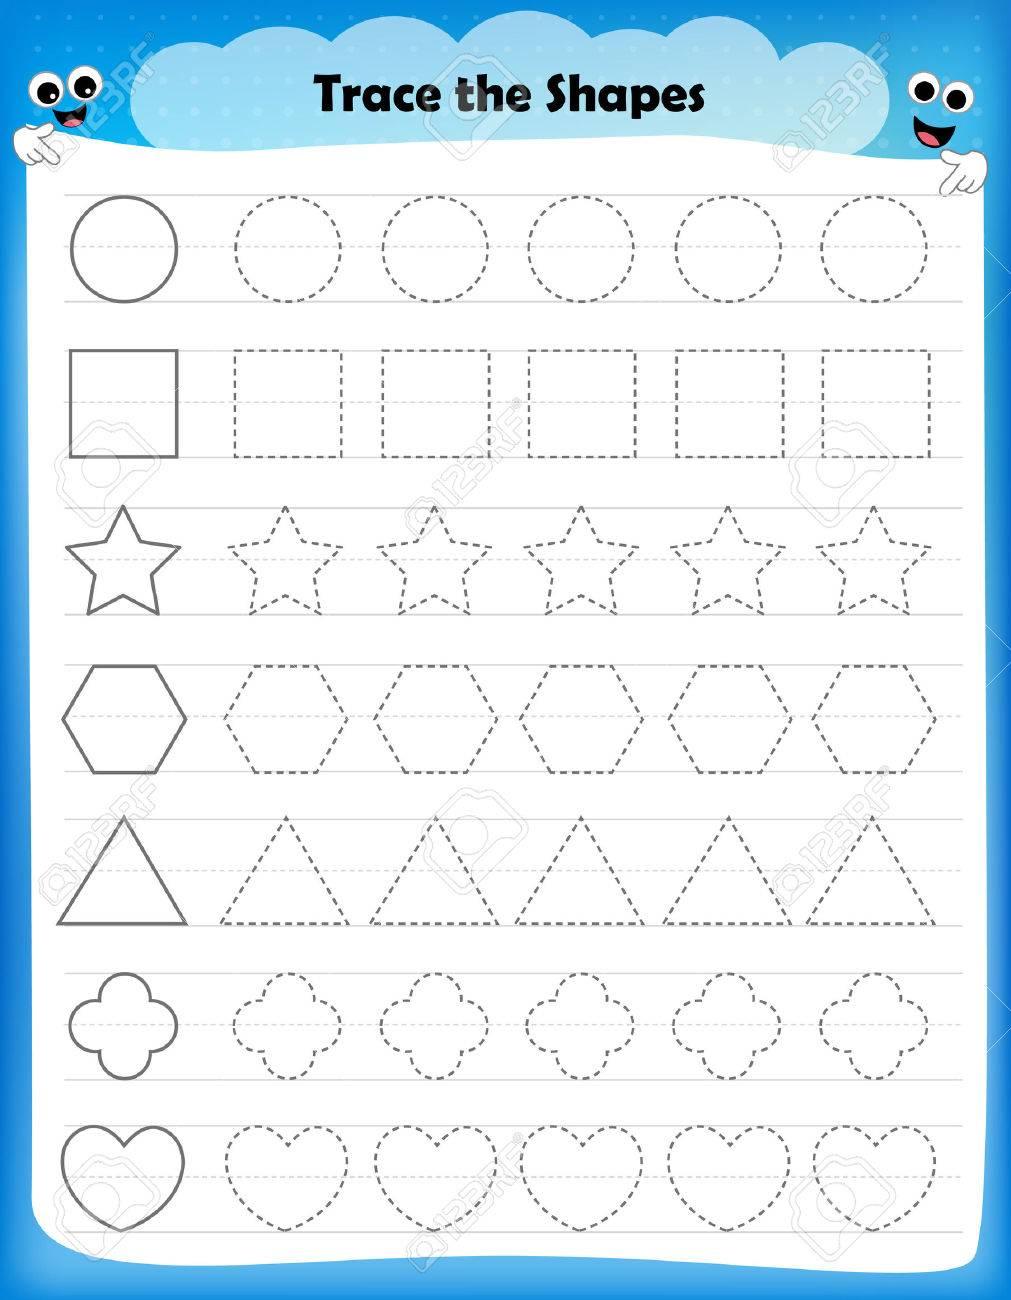 Workbooks shapes tracing worksheets preschool : Preschool Worksheet For Kids. Tracing Shapes Writing Practice ...